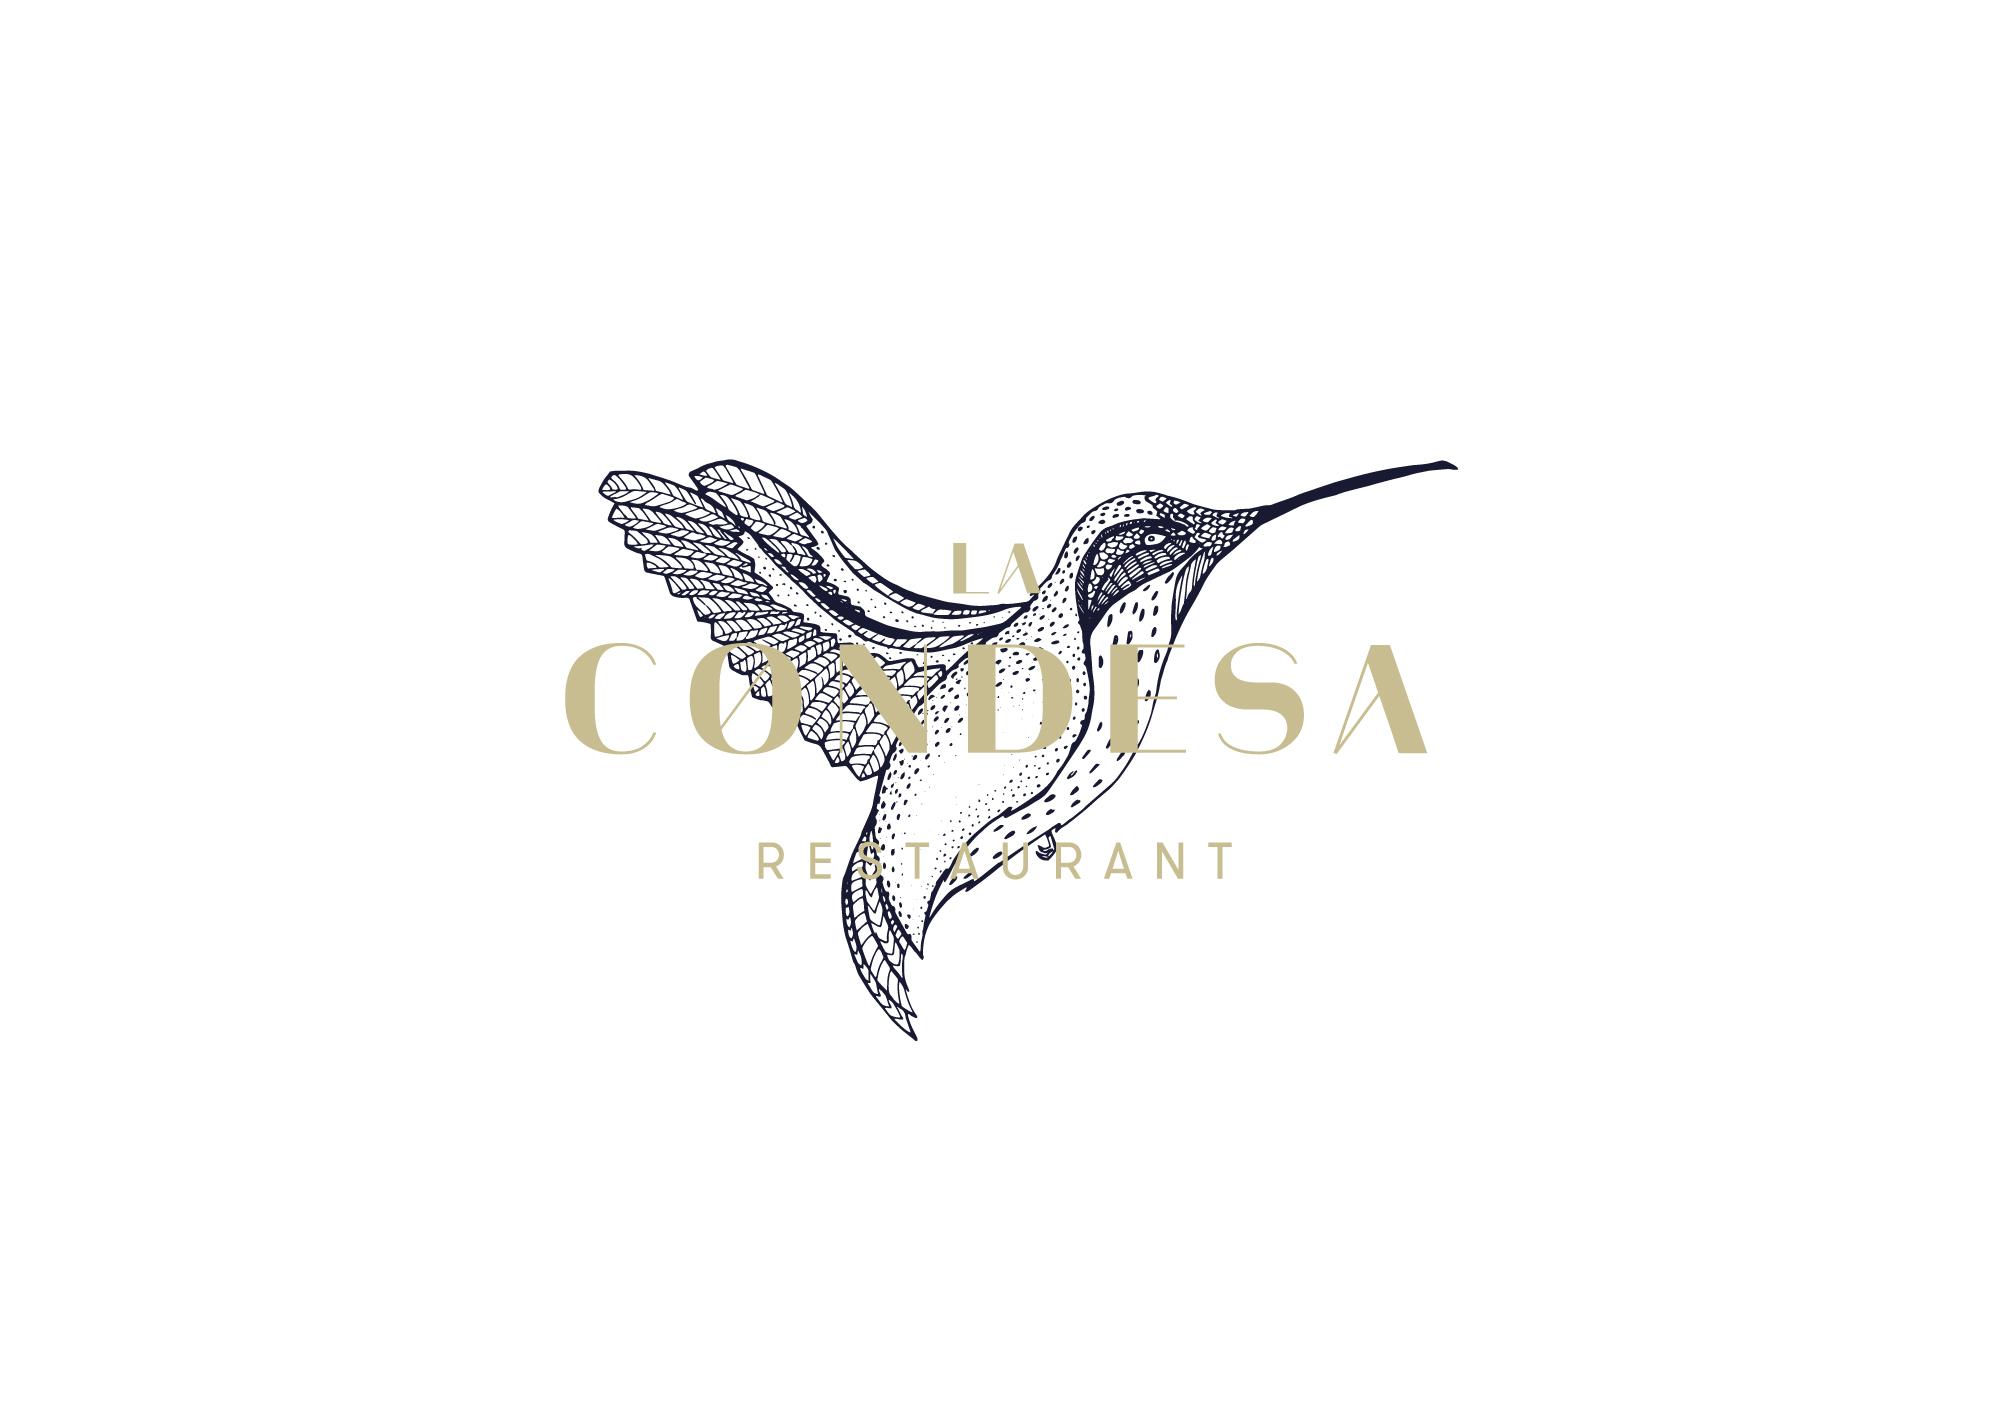 La Condesa restaurant